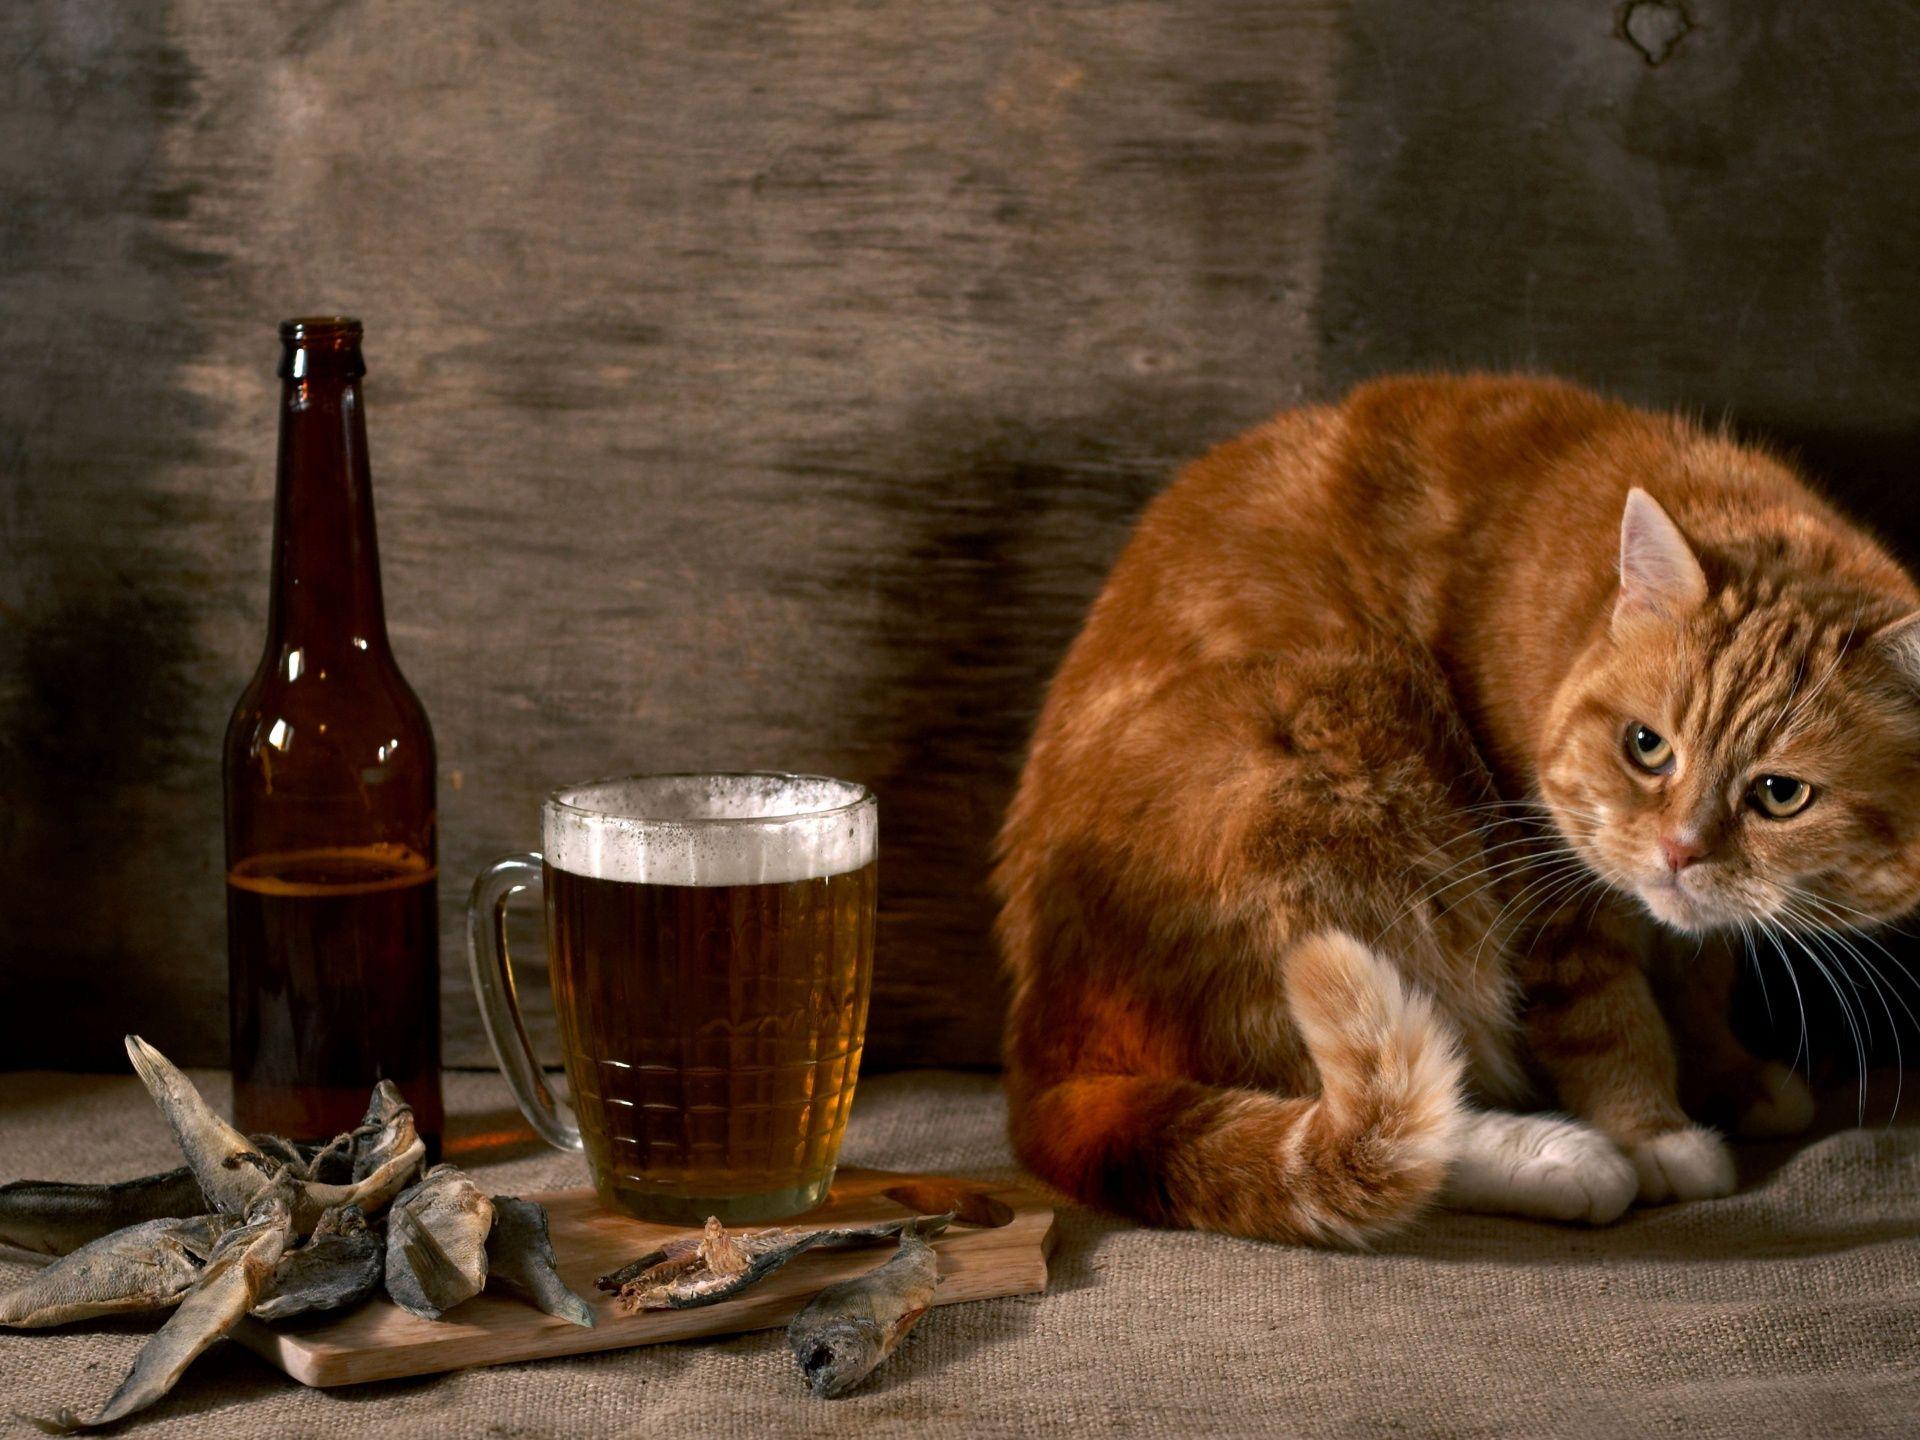 Фото котят алтайского ирбиса оформления